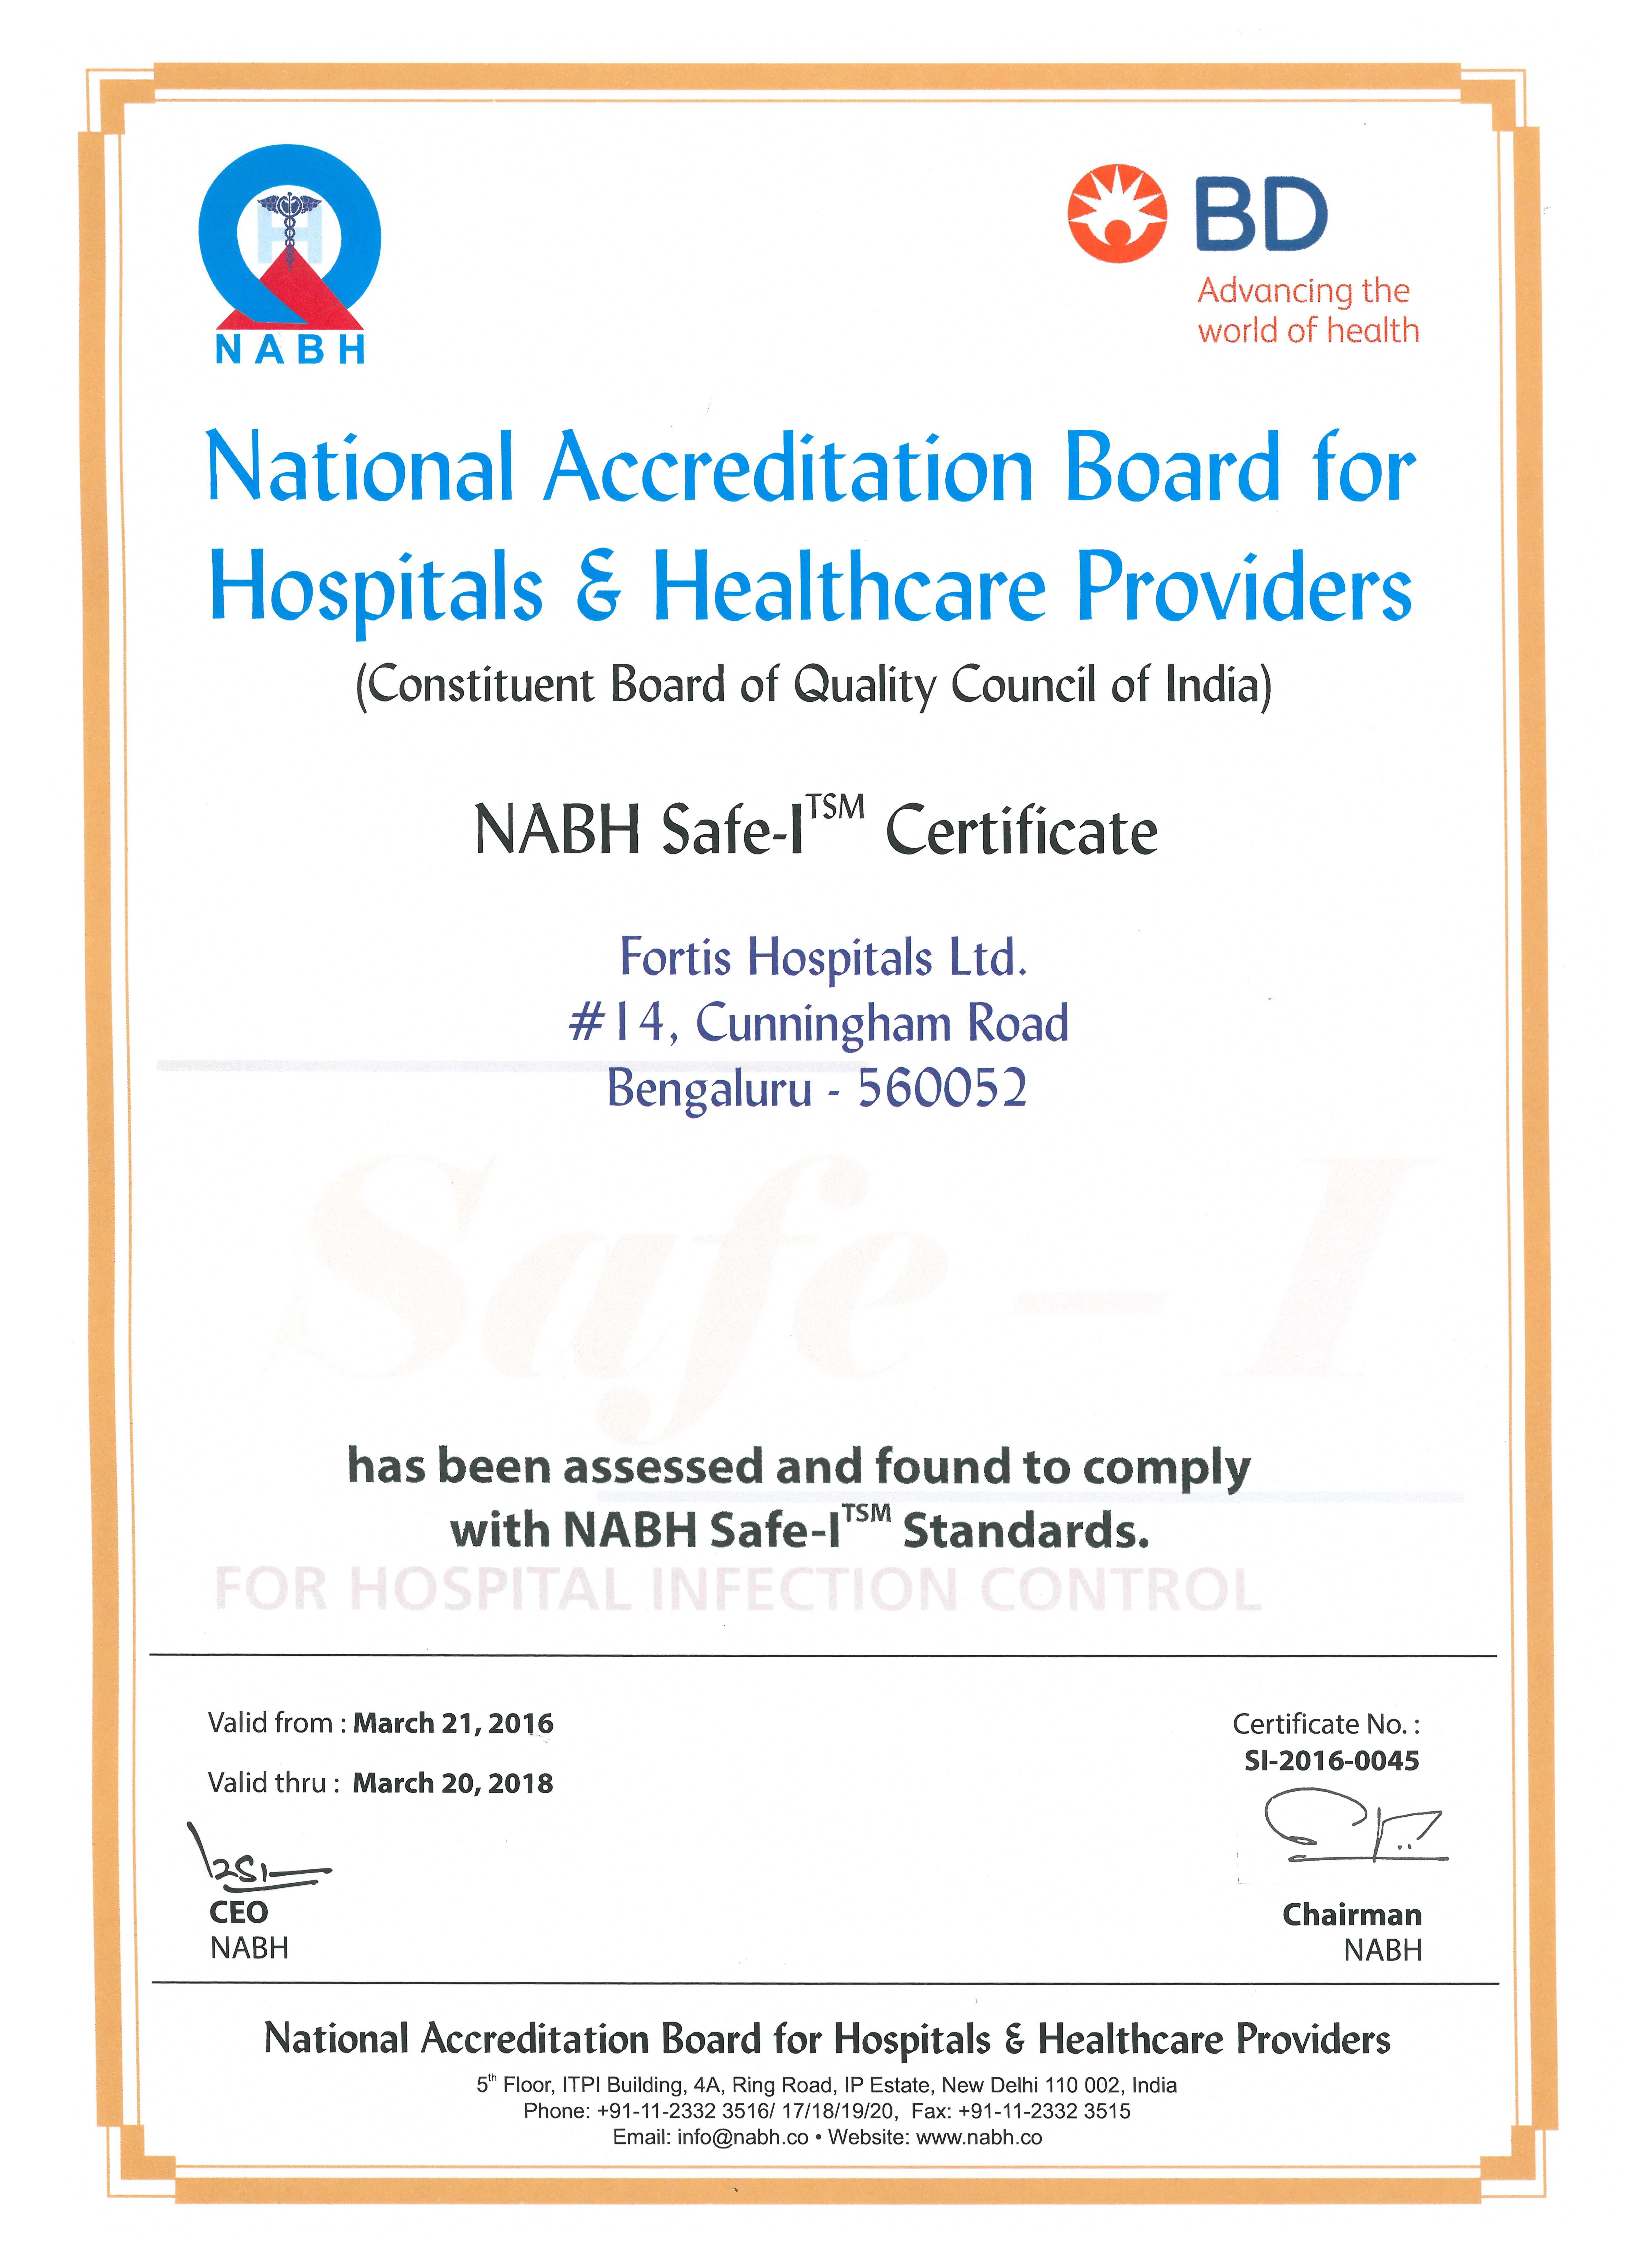 Fortis Hospitals Cunningham Road Bags Nabh Safe I Certification